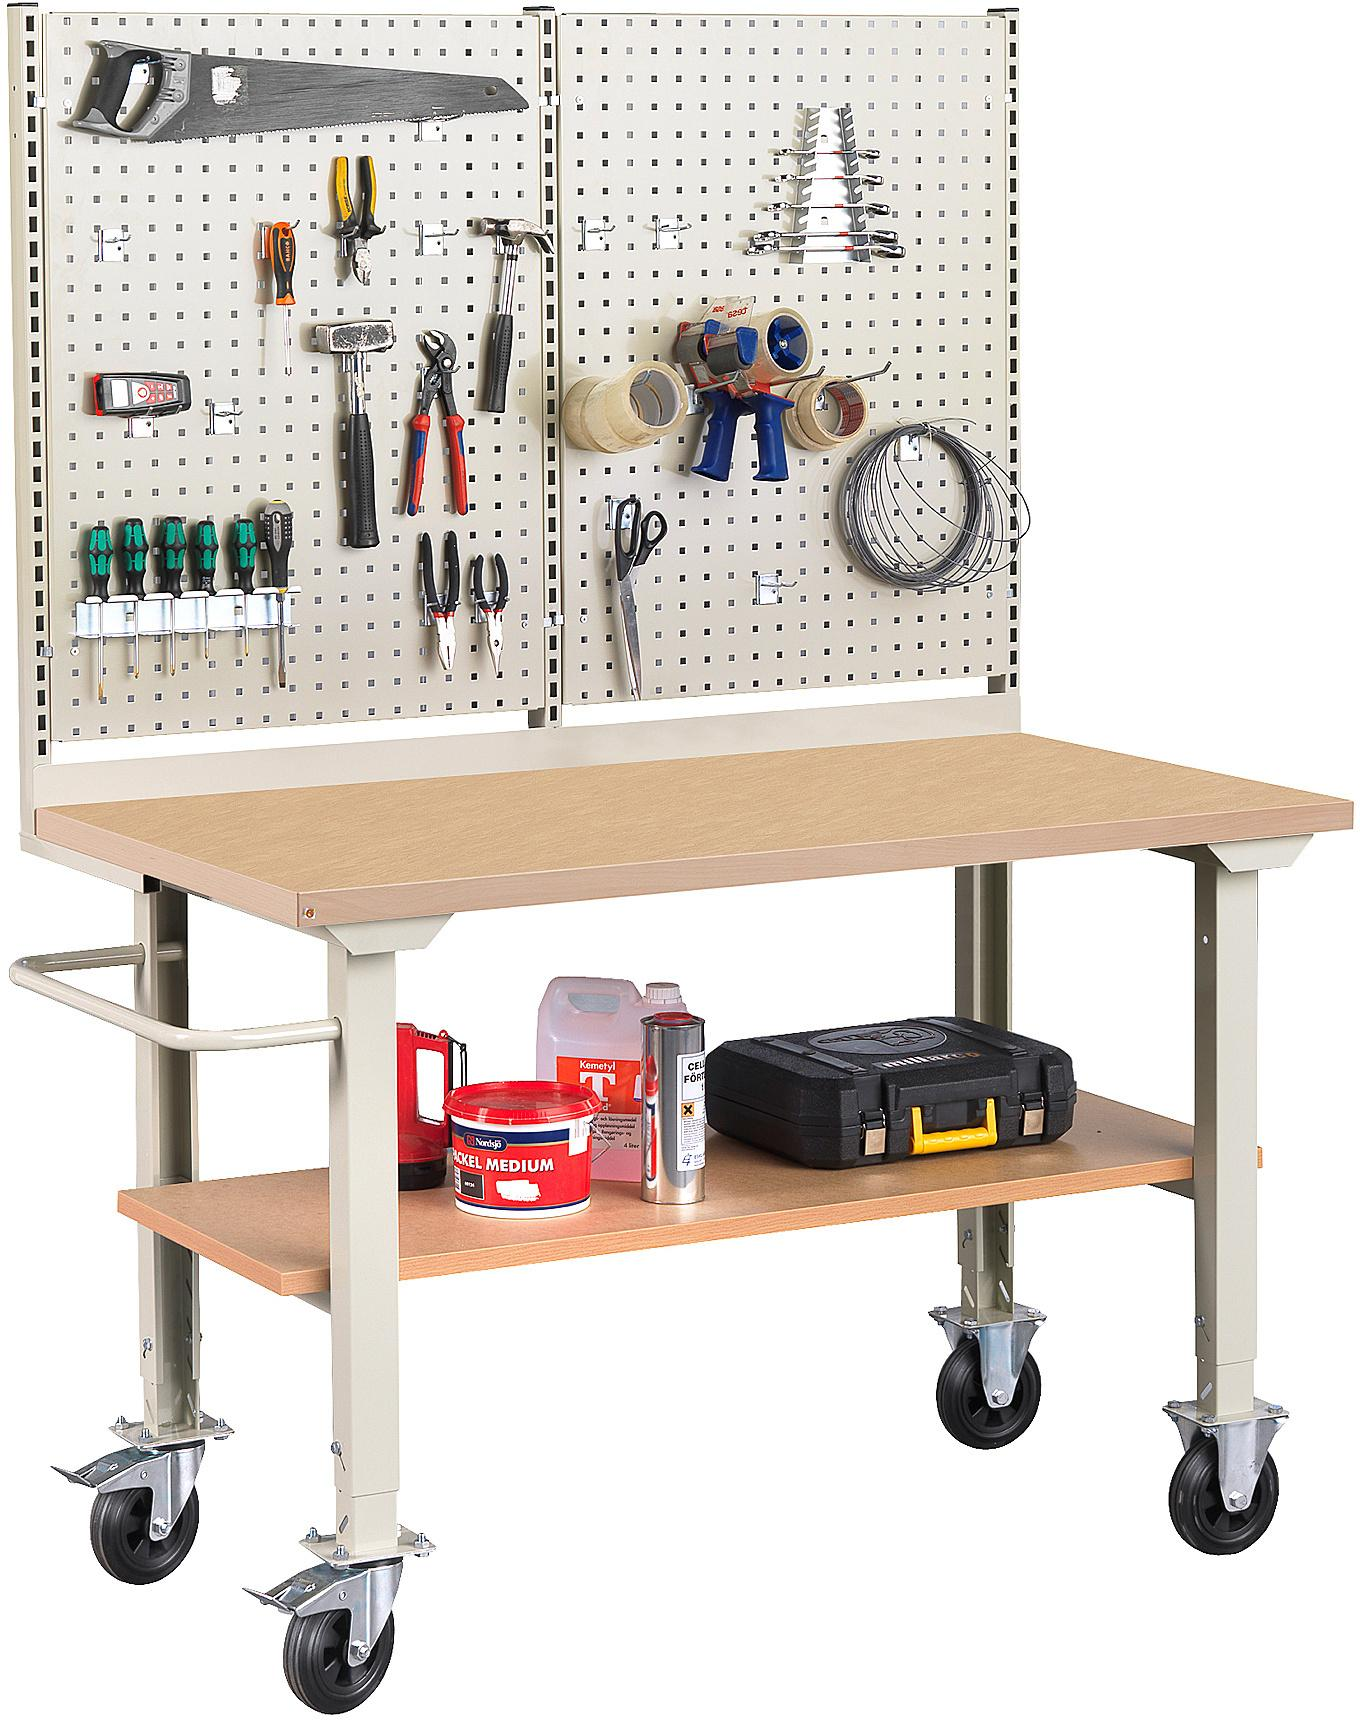 Mobilný dielenský stôl Robust, 1500x800 mm, tvrdená doska